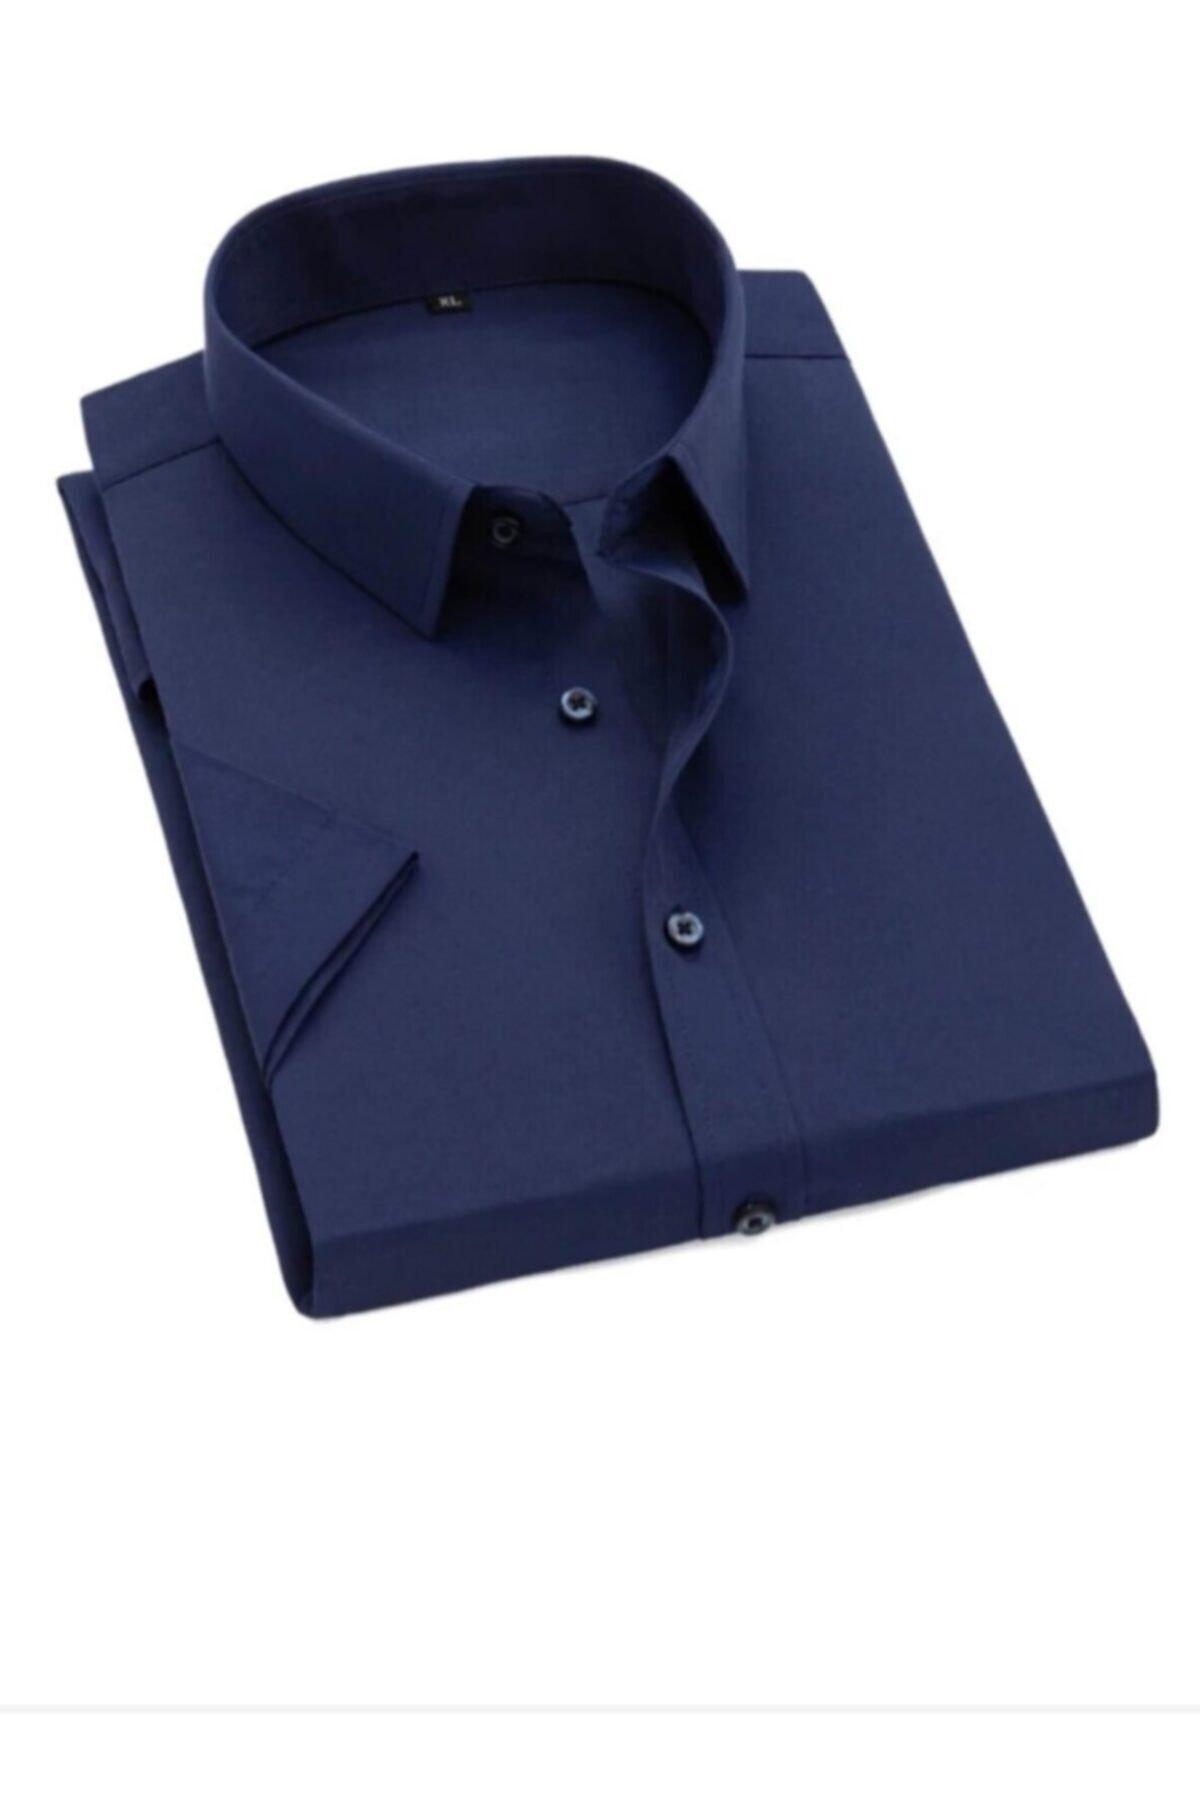 پیراهن مردانه اینترنتی برند nacar çarşı رنگ لاجوردی کد ty97444868